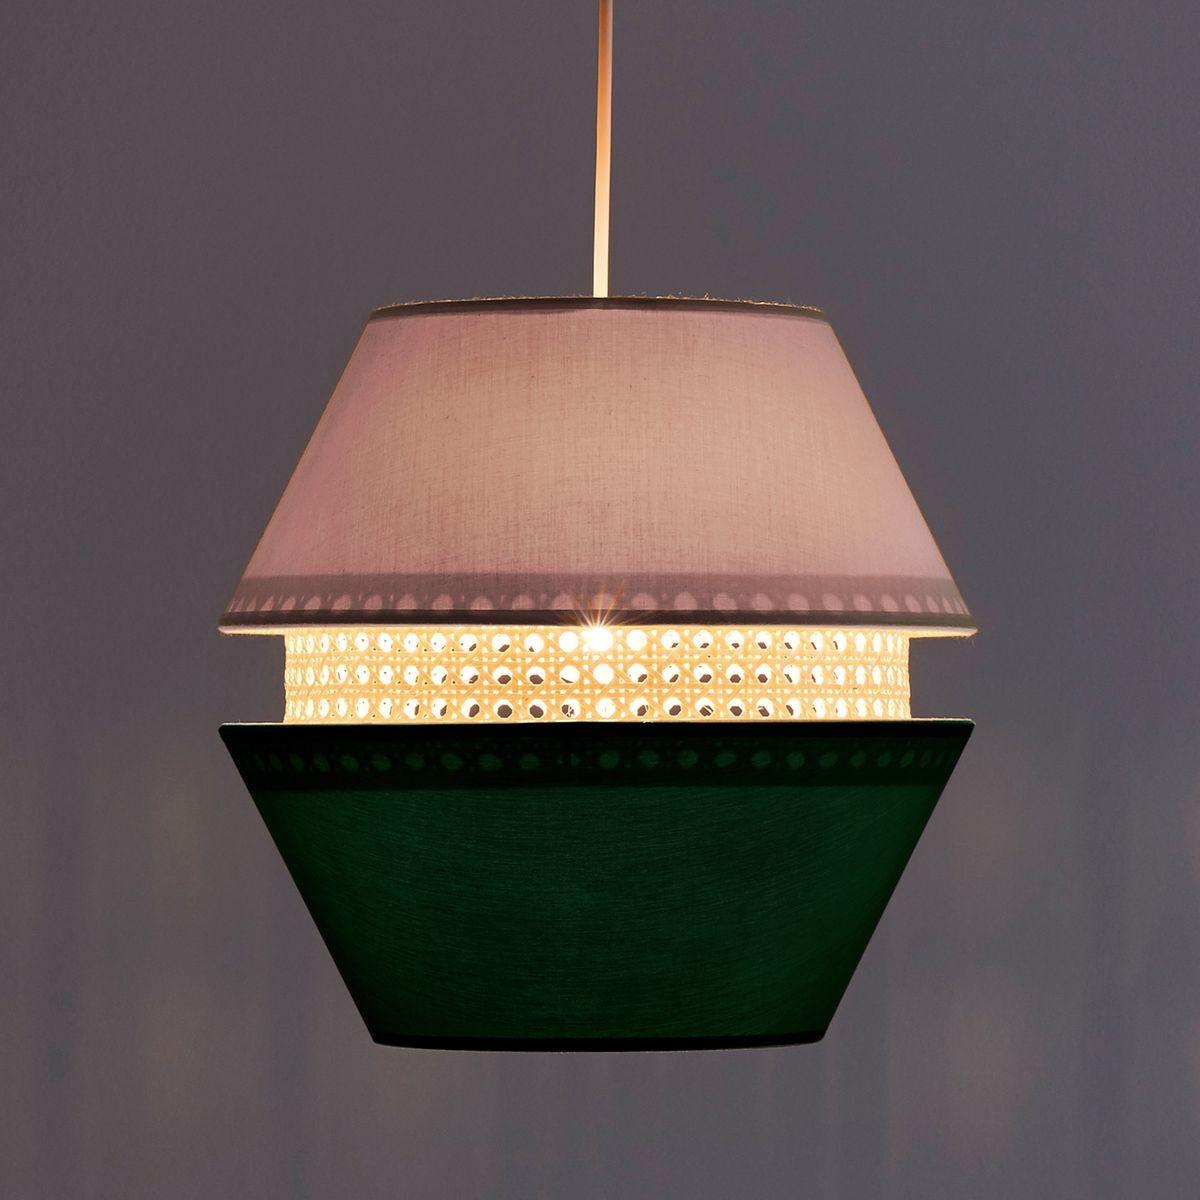 tendance-cannage-lampe-redoute3-kc.jpg